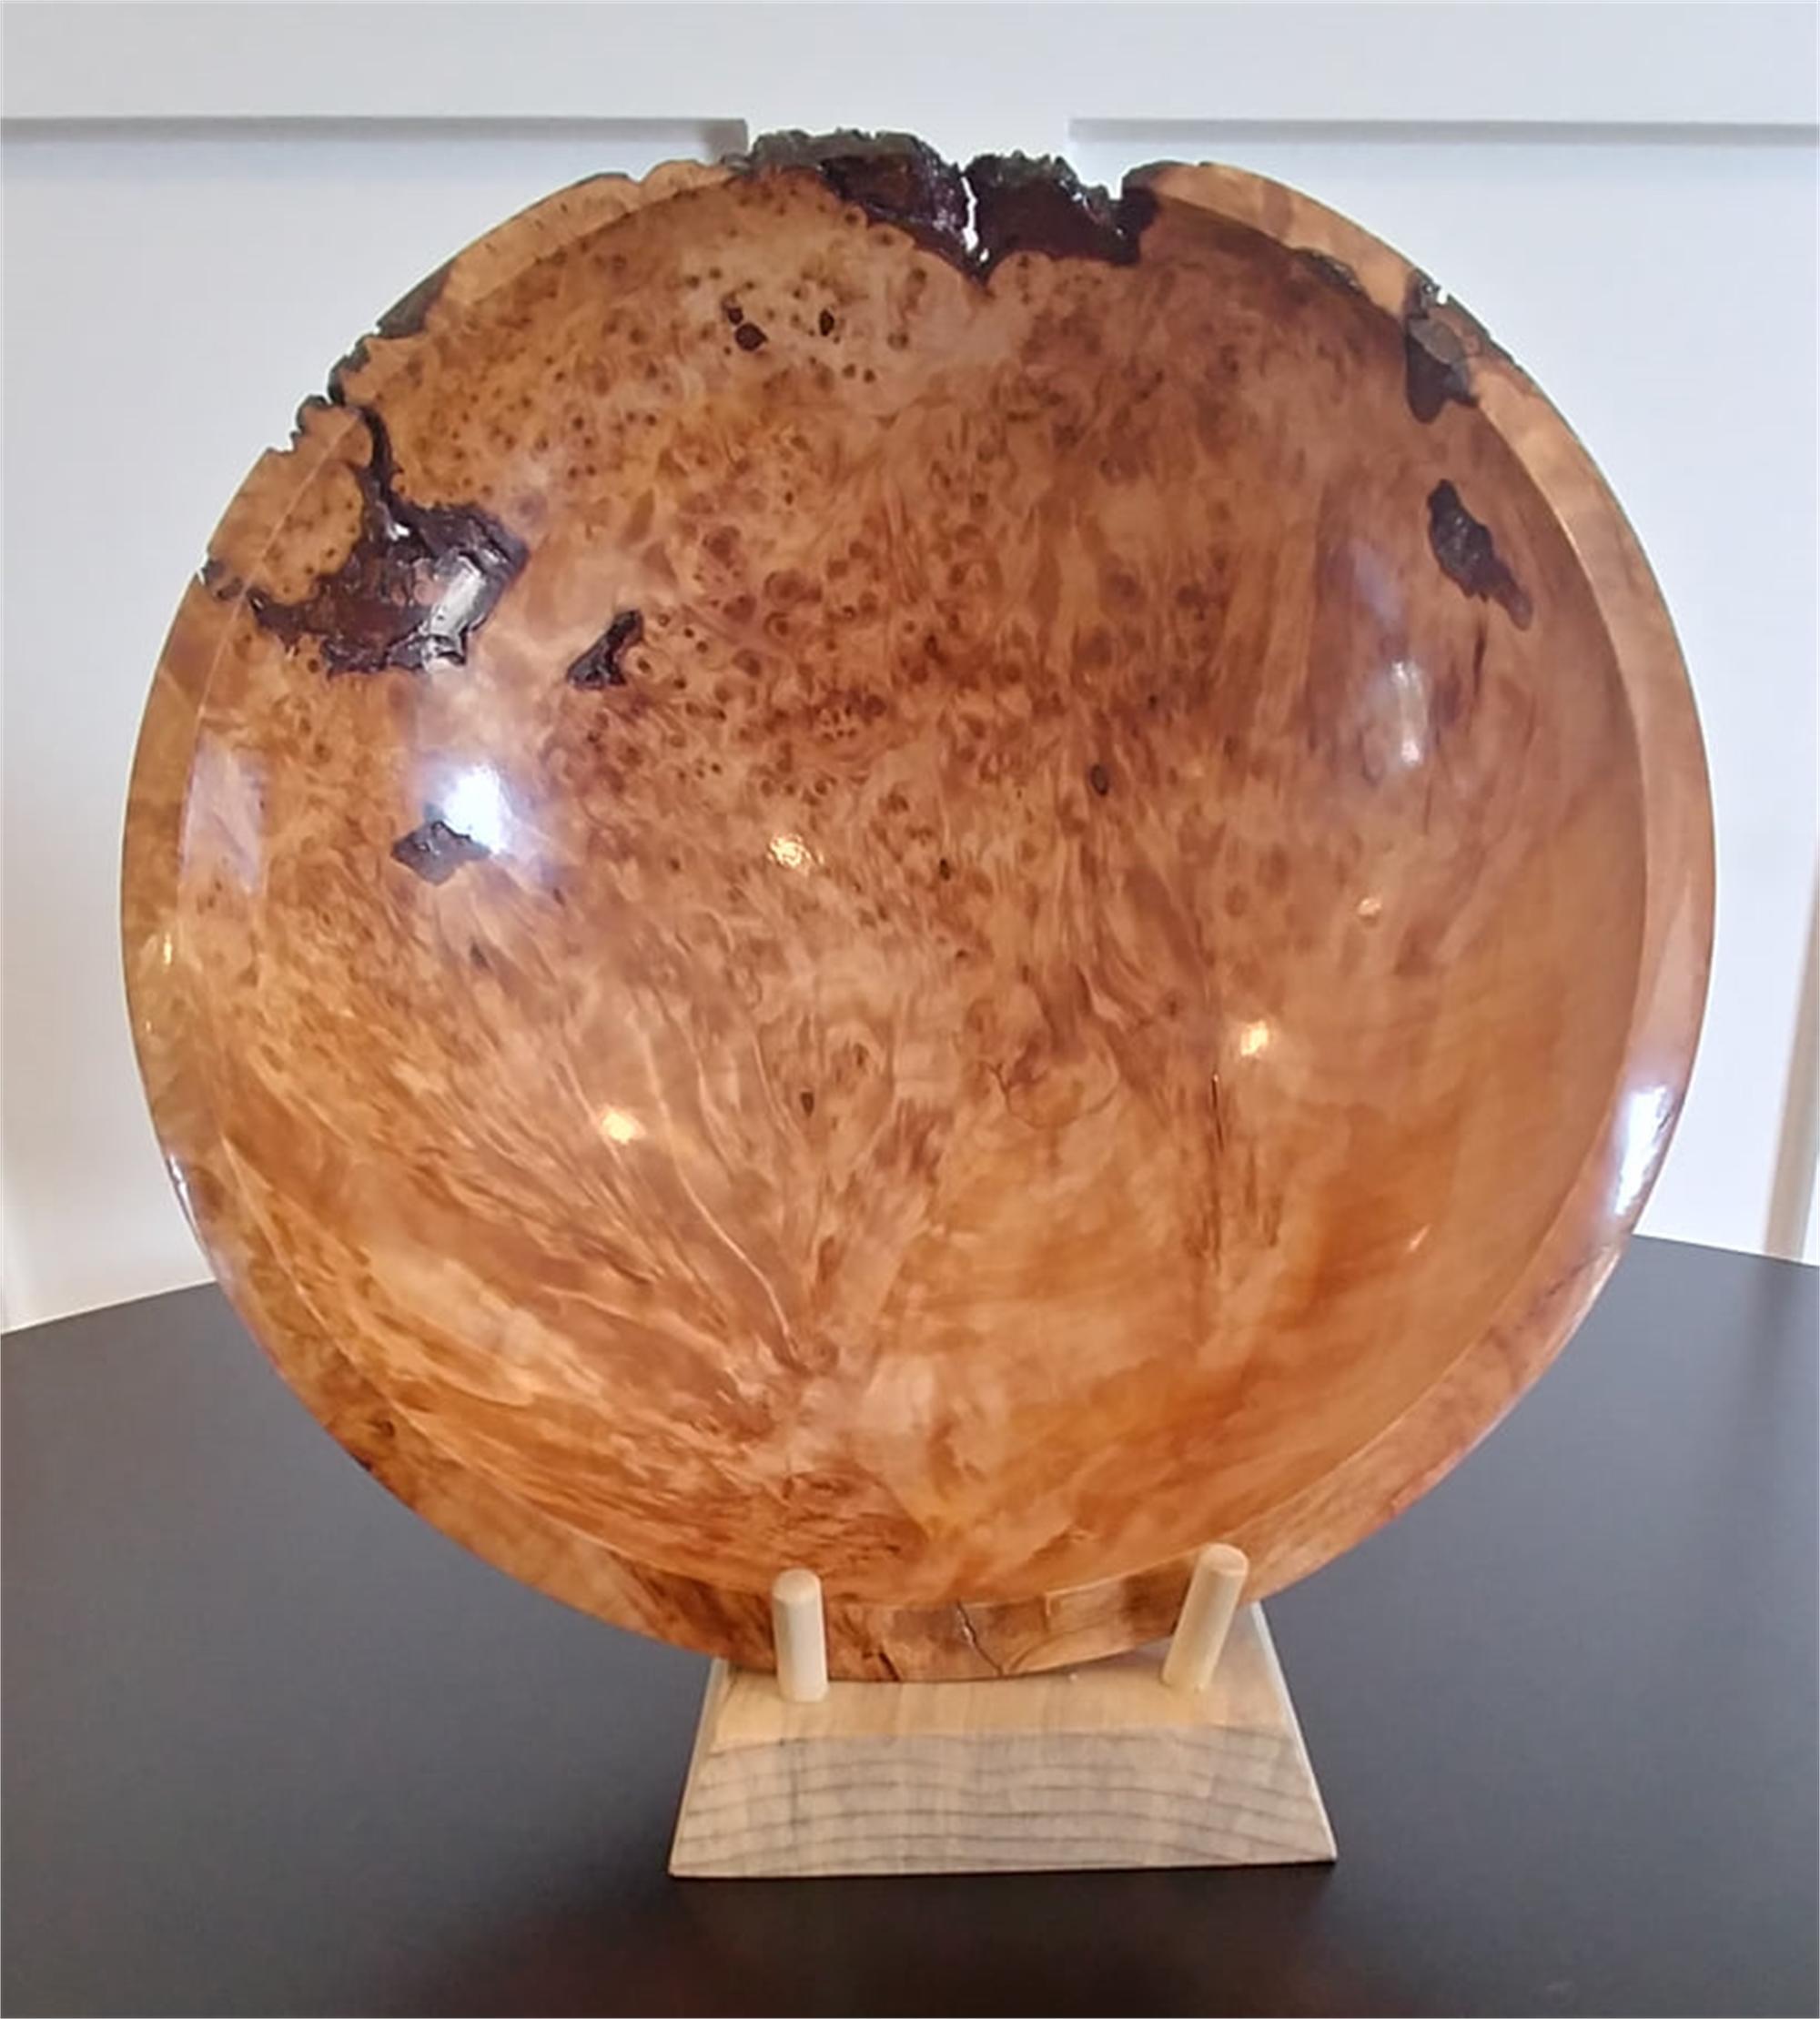 Myrtle Burl Bowl by Gary Dahrens (Lafayette, OR)